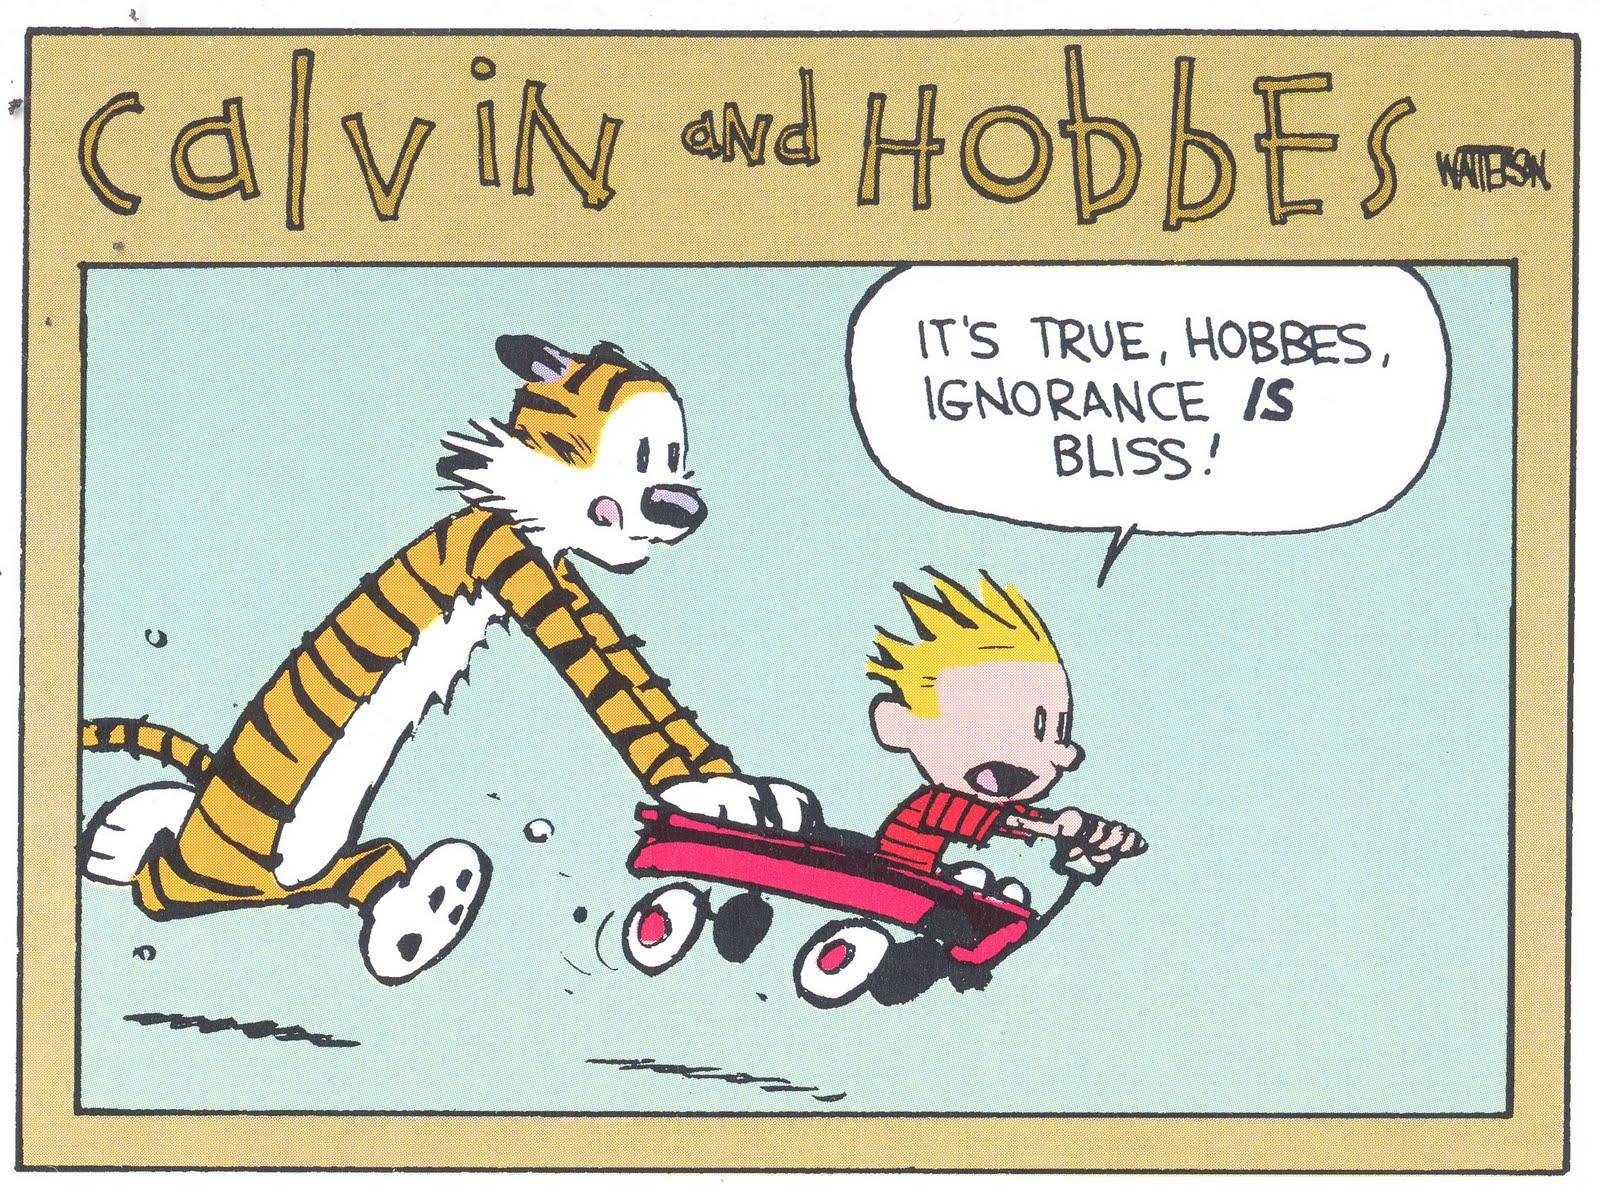 Ignorance – curse or bliss?